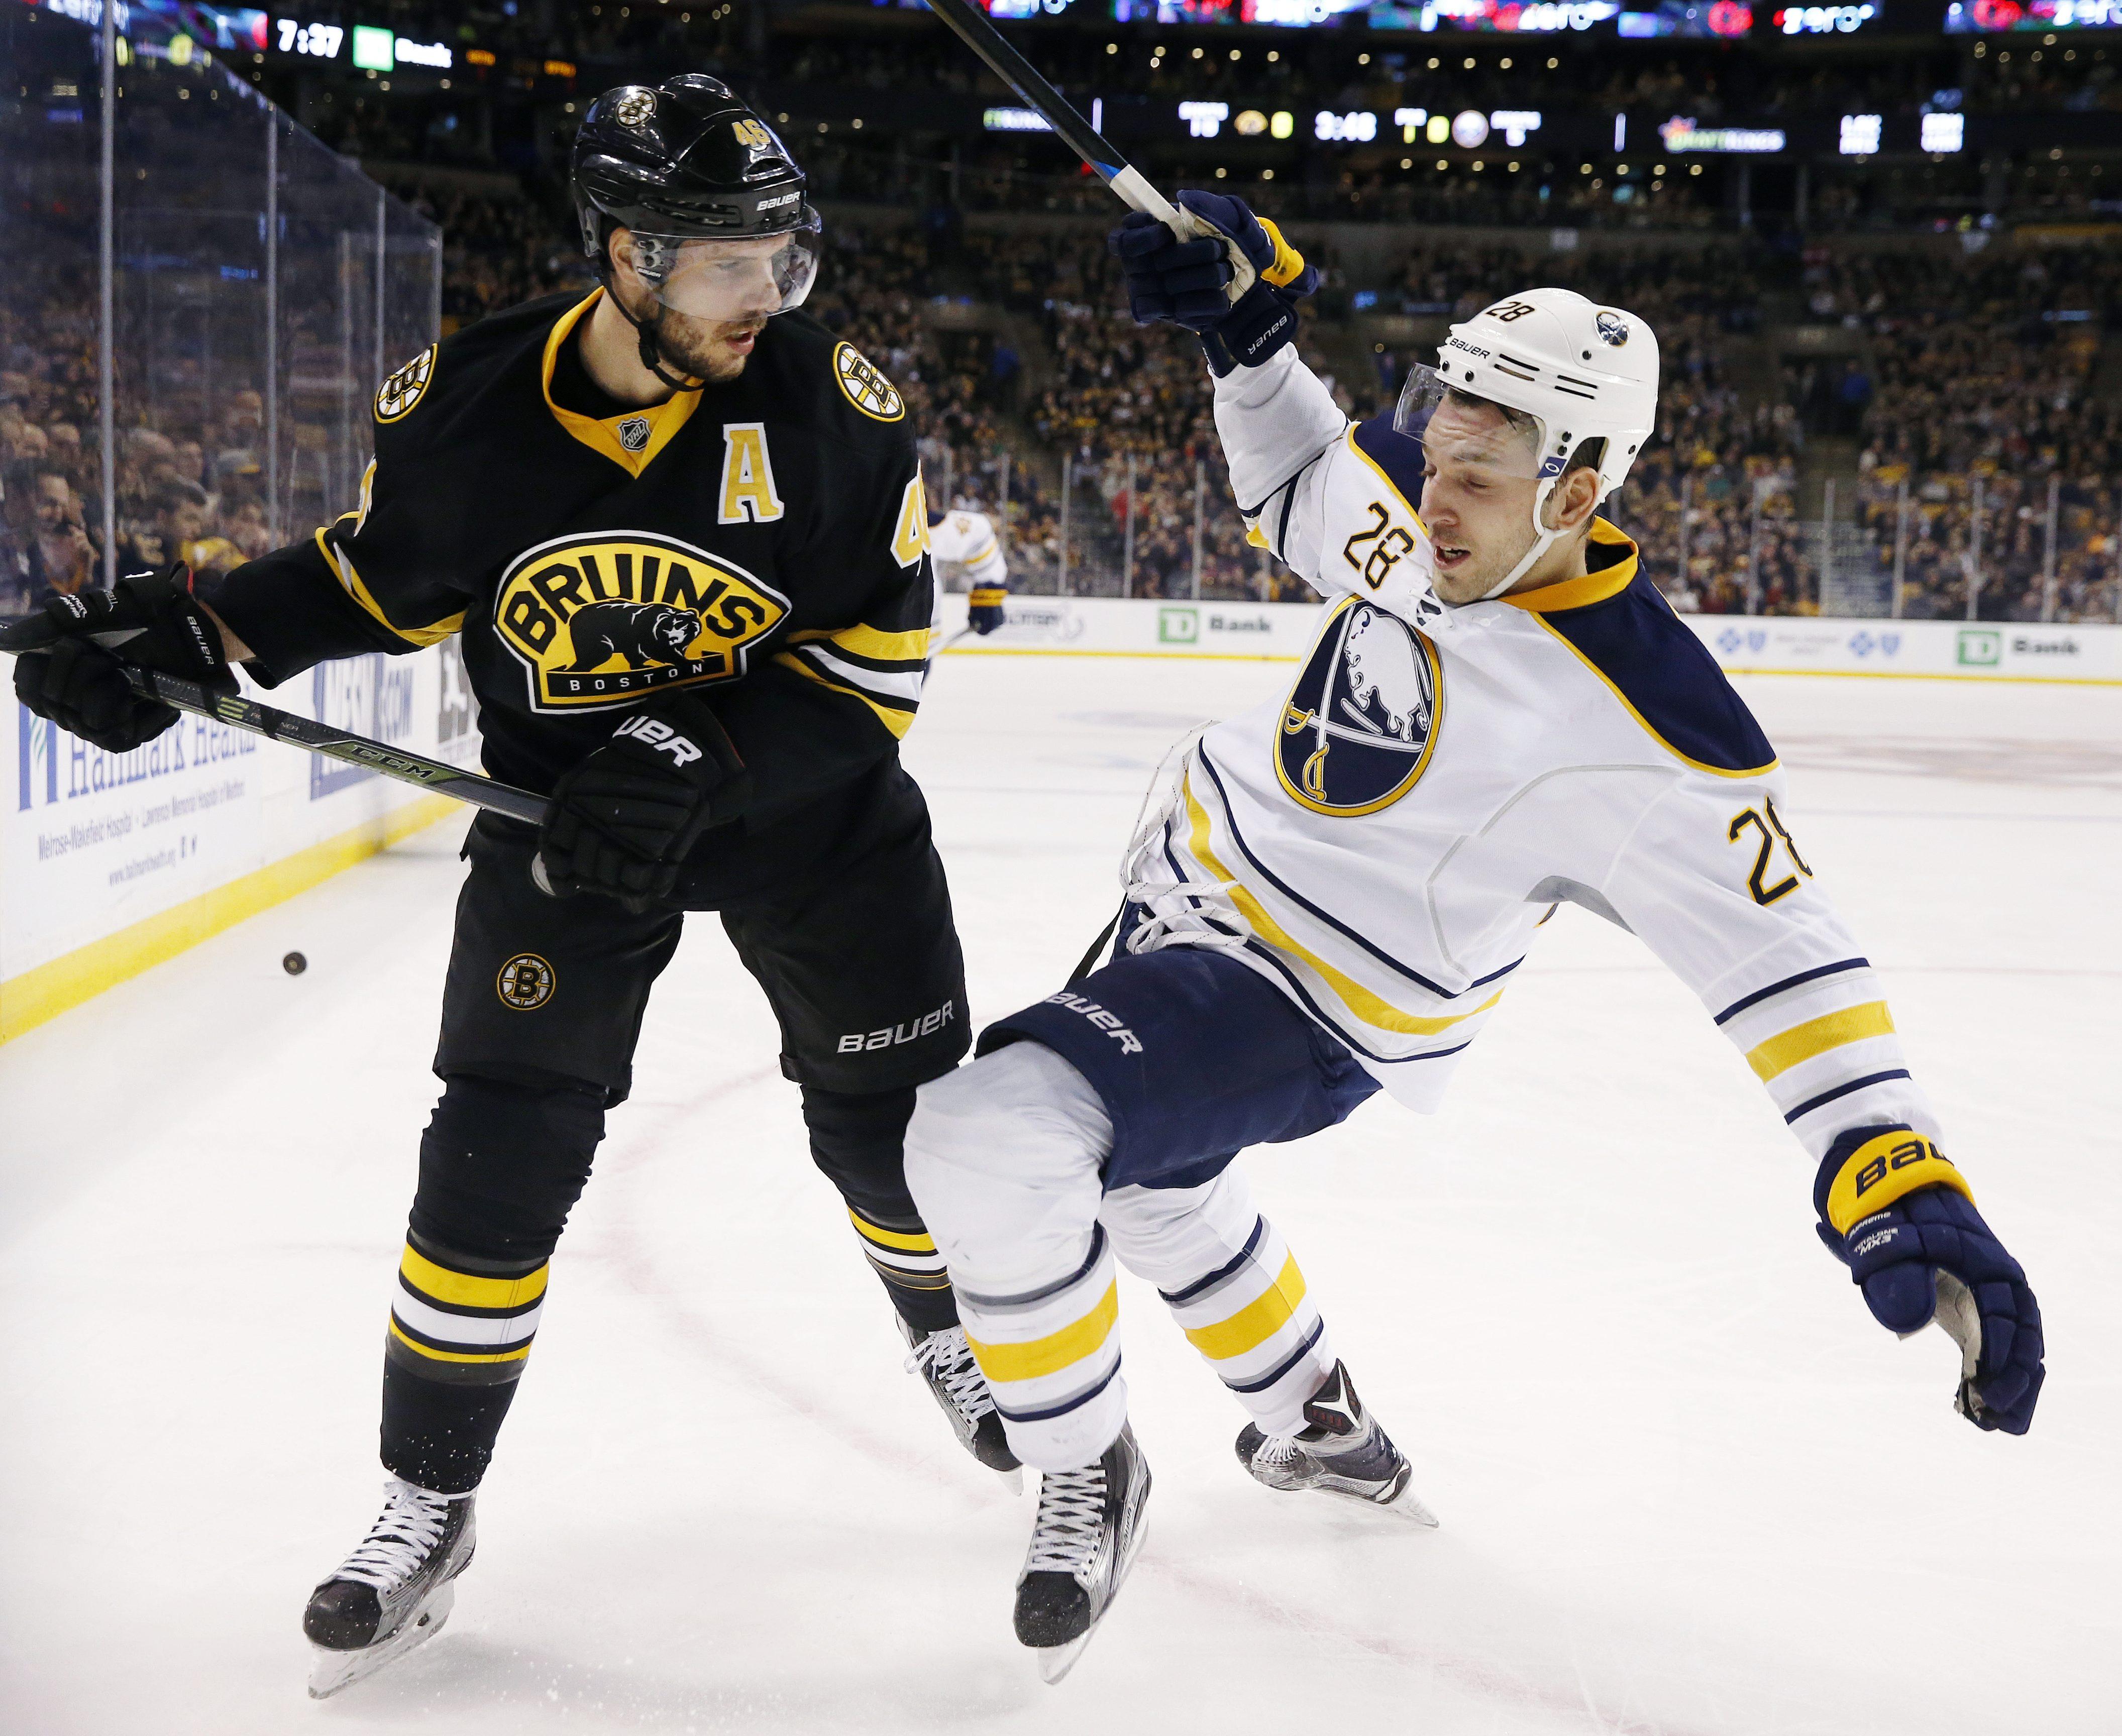 Boston Bruins' David Krejci (46) checks Buffalo Sabres' Zemgus Girgensons (28) during the first period of an NHL hockey game in Boston, Saturday, Dec. 26, 2015. (AP Photo/Michael Dwyer)